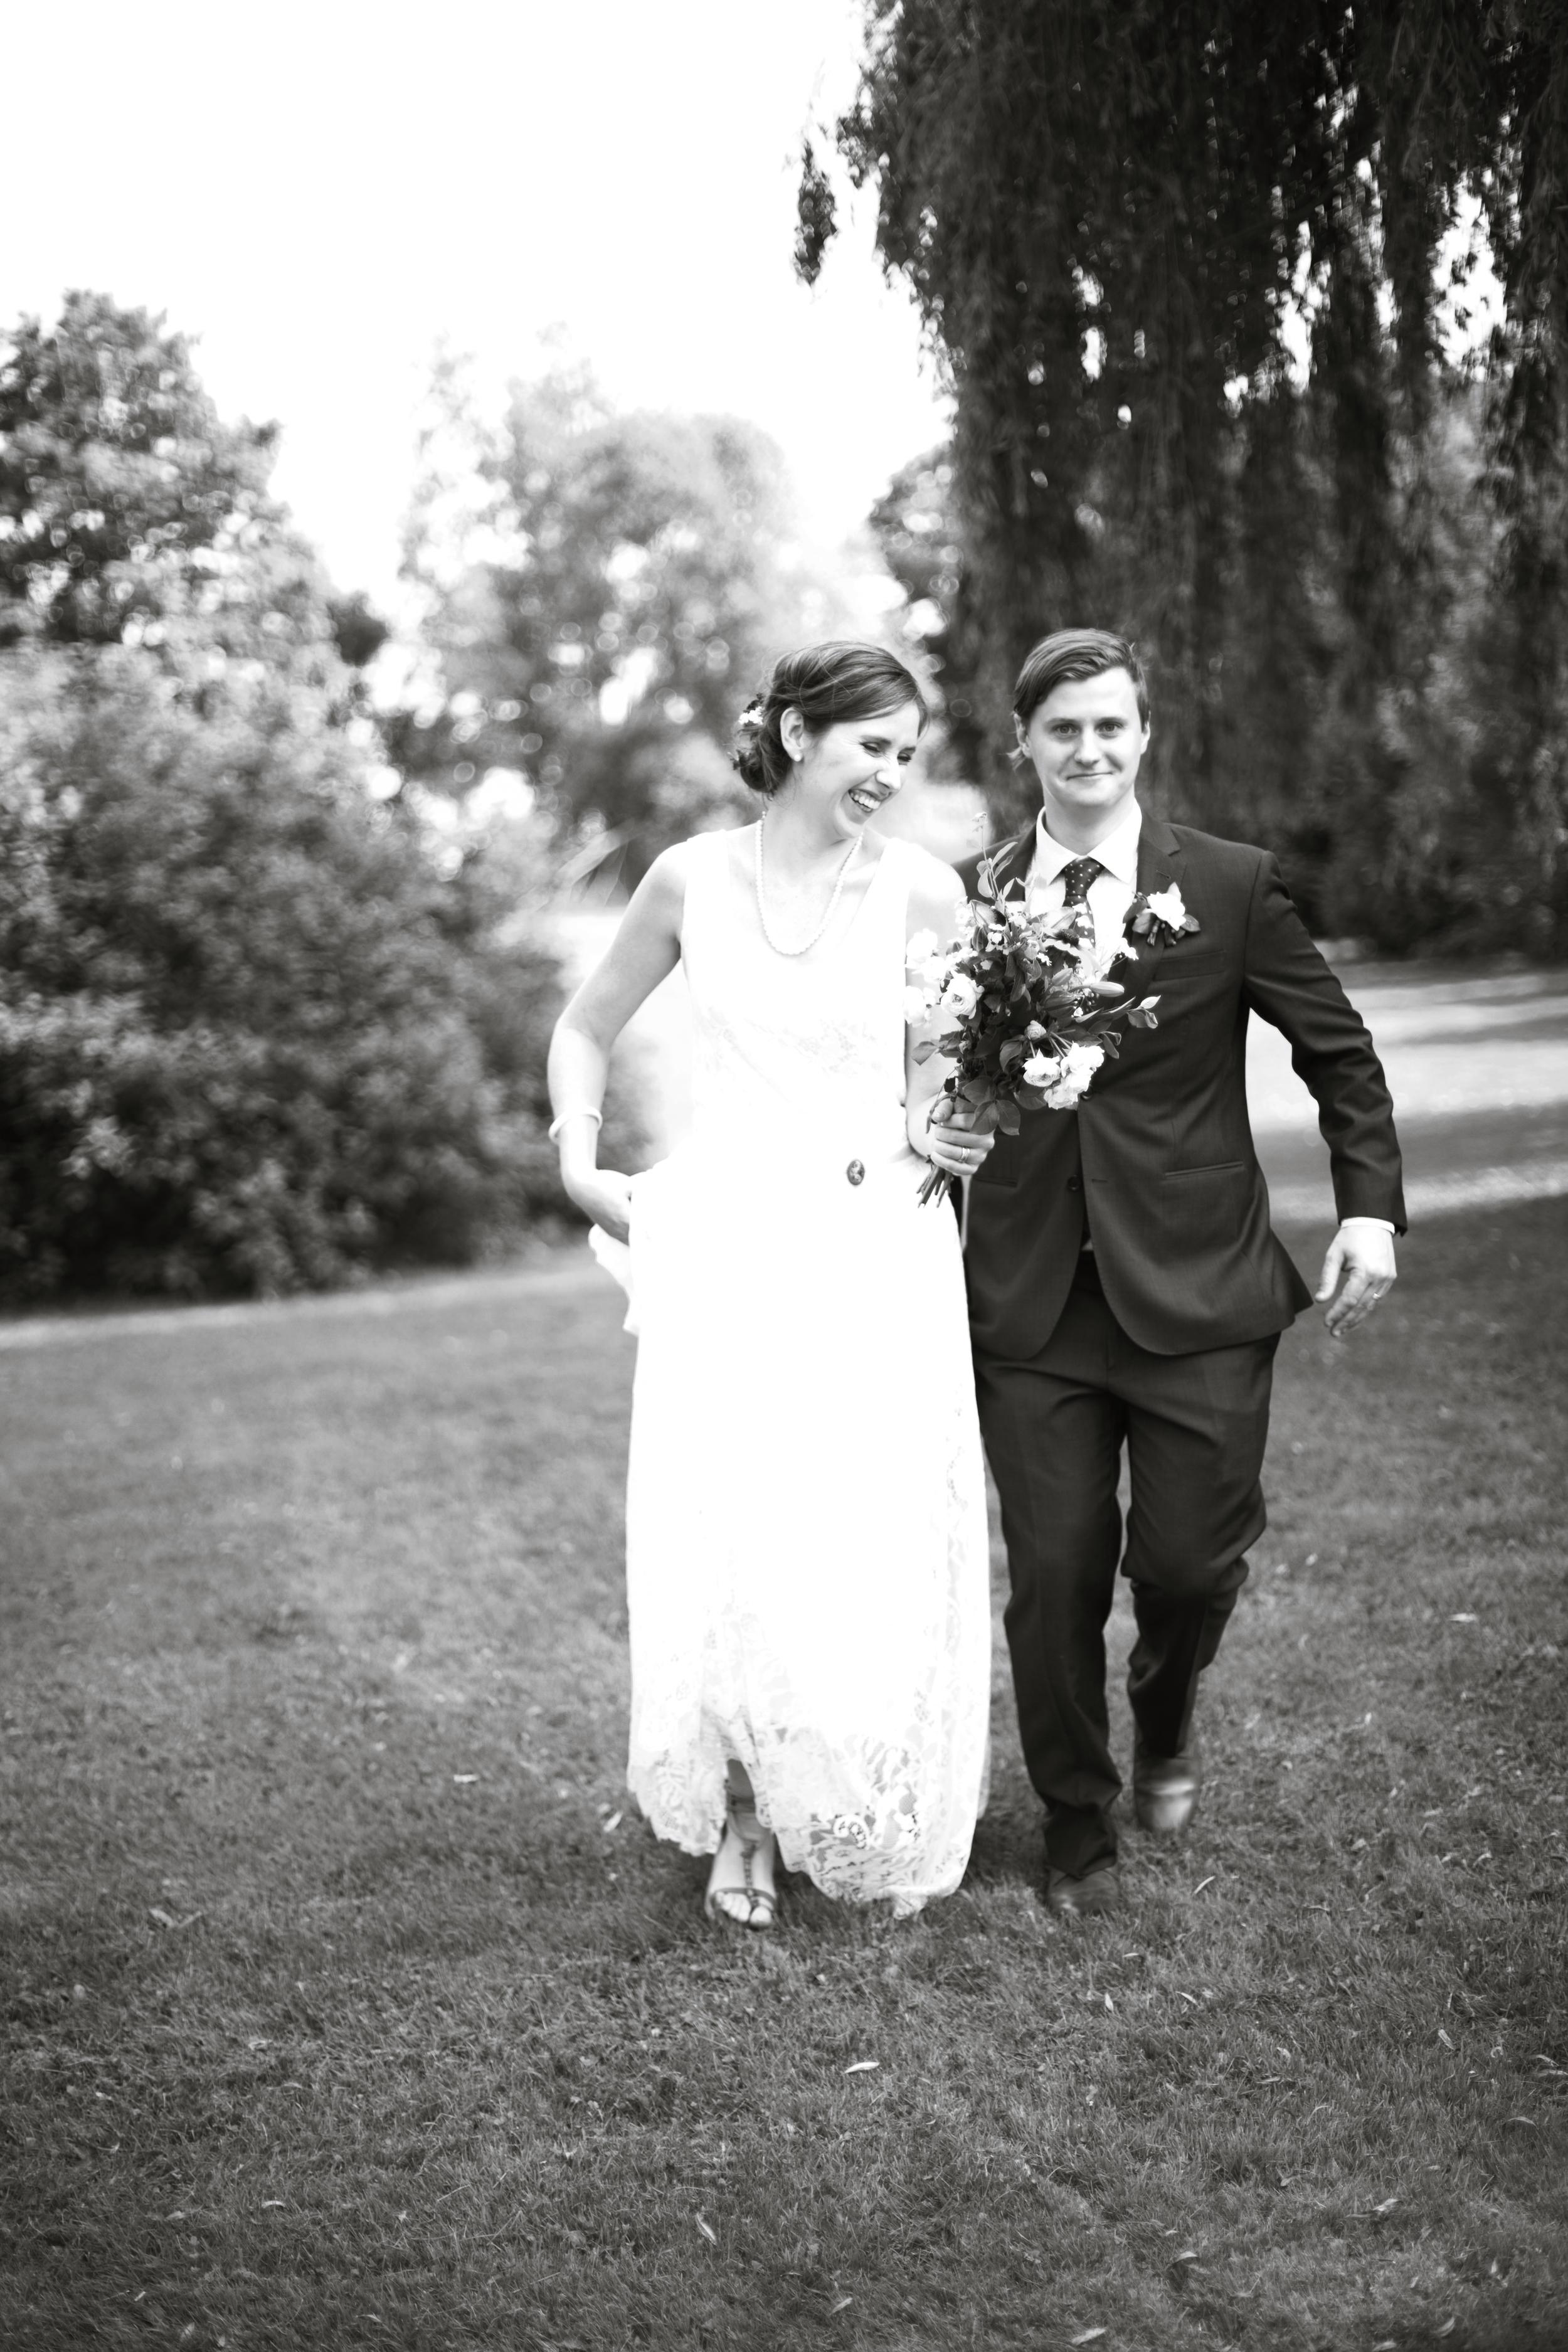 Toronto Wedding Photographer - DIY Weddings - Petticoat Creek Conservation Area - Pickering - Ontario